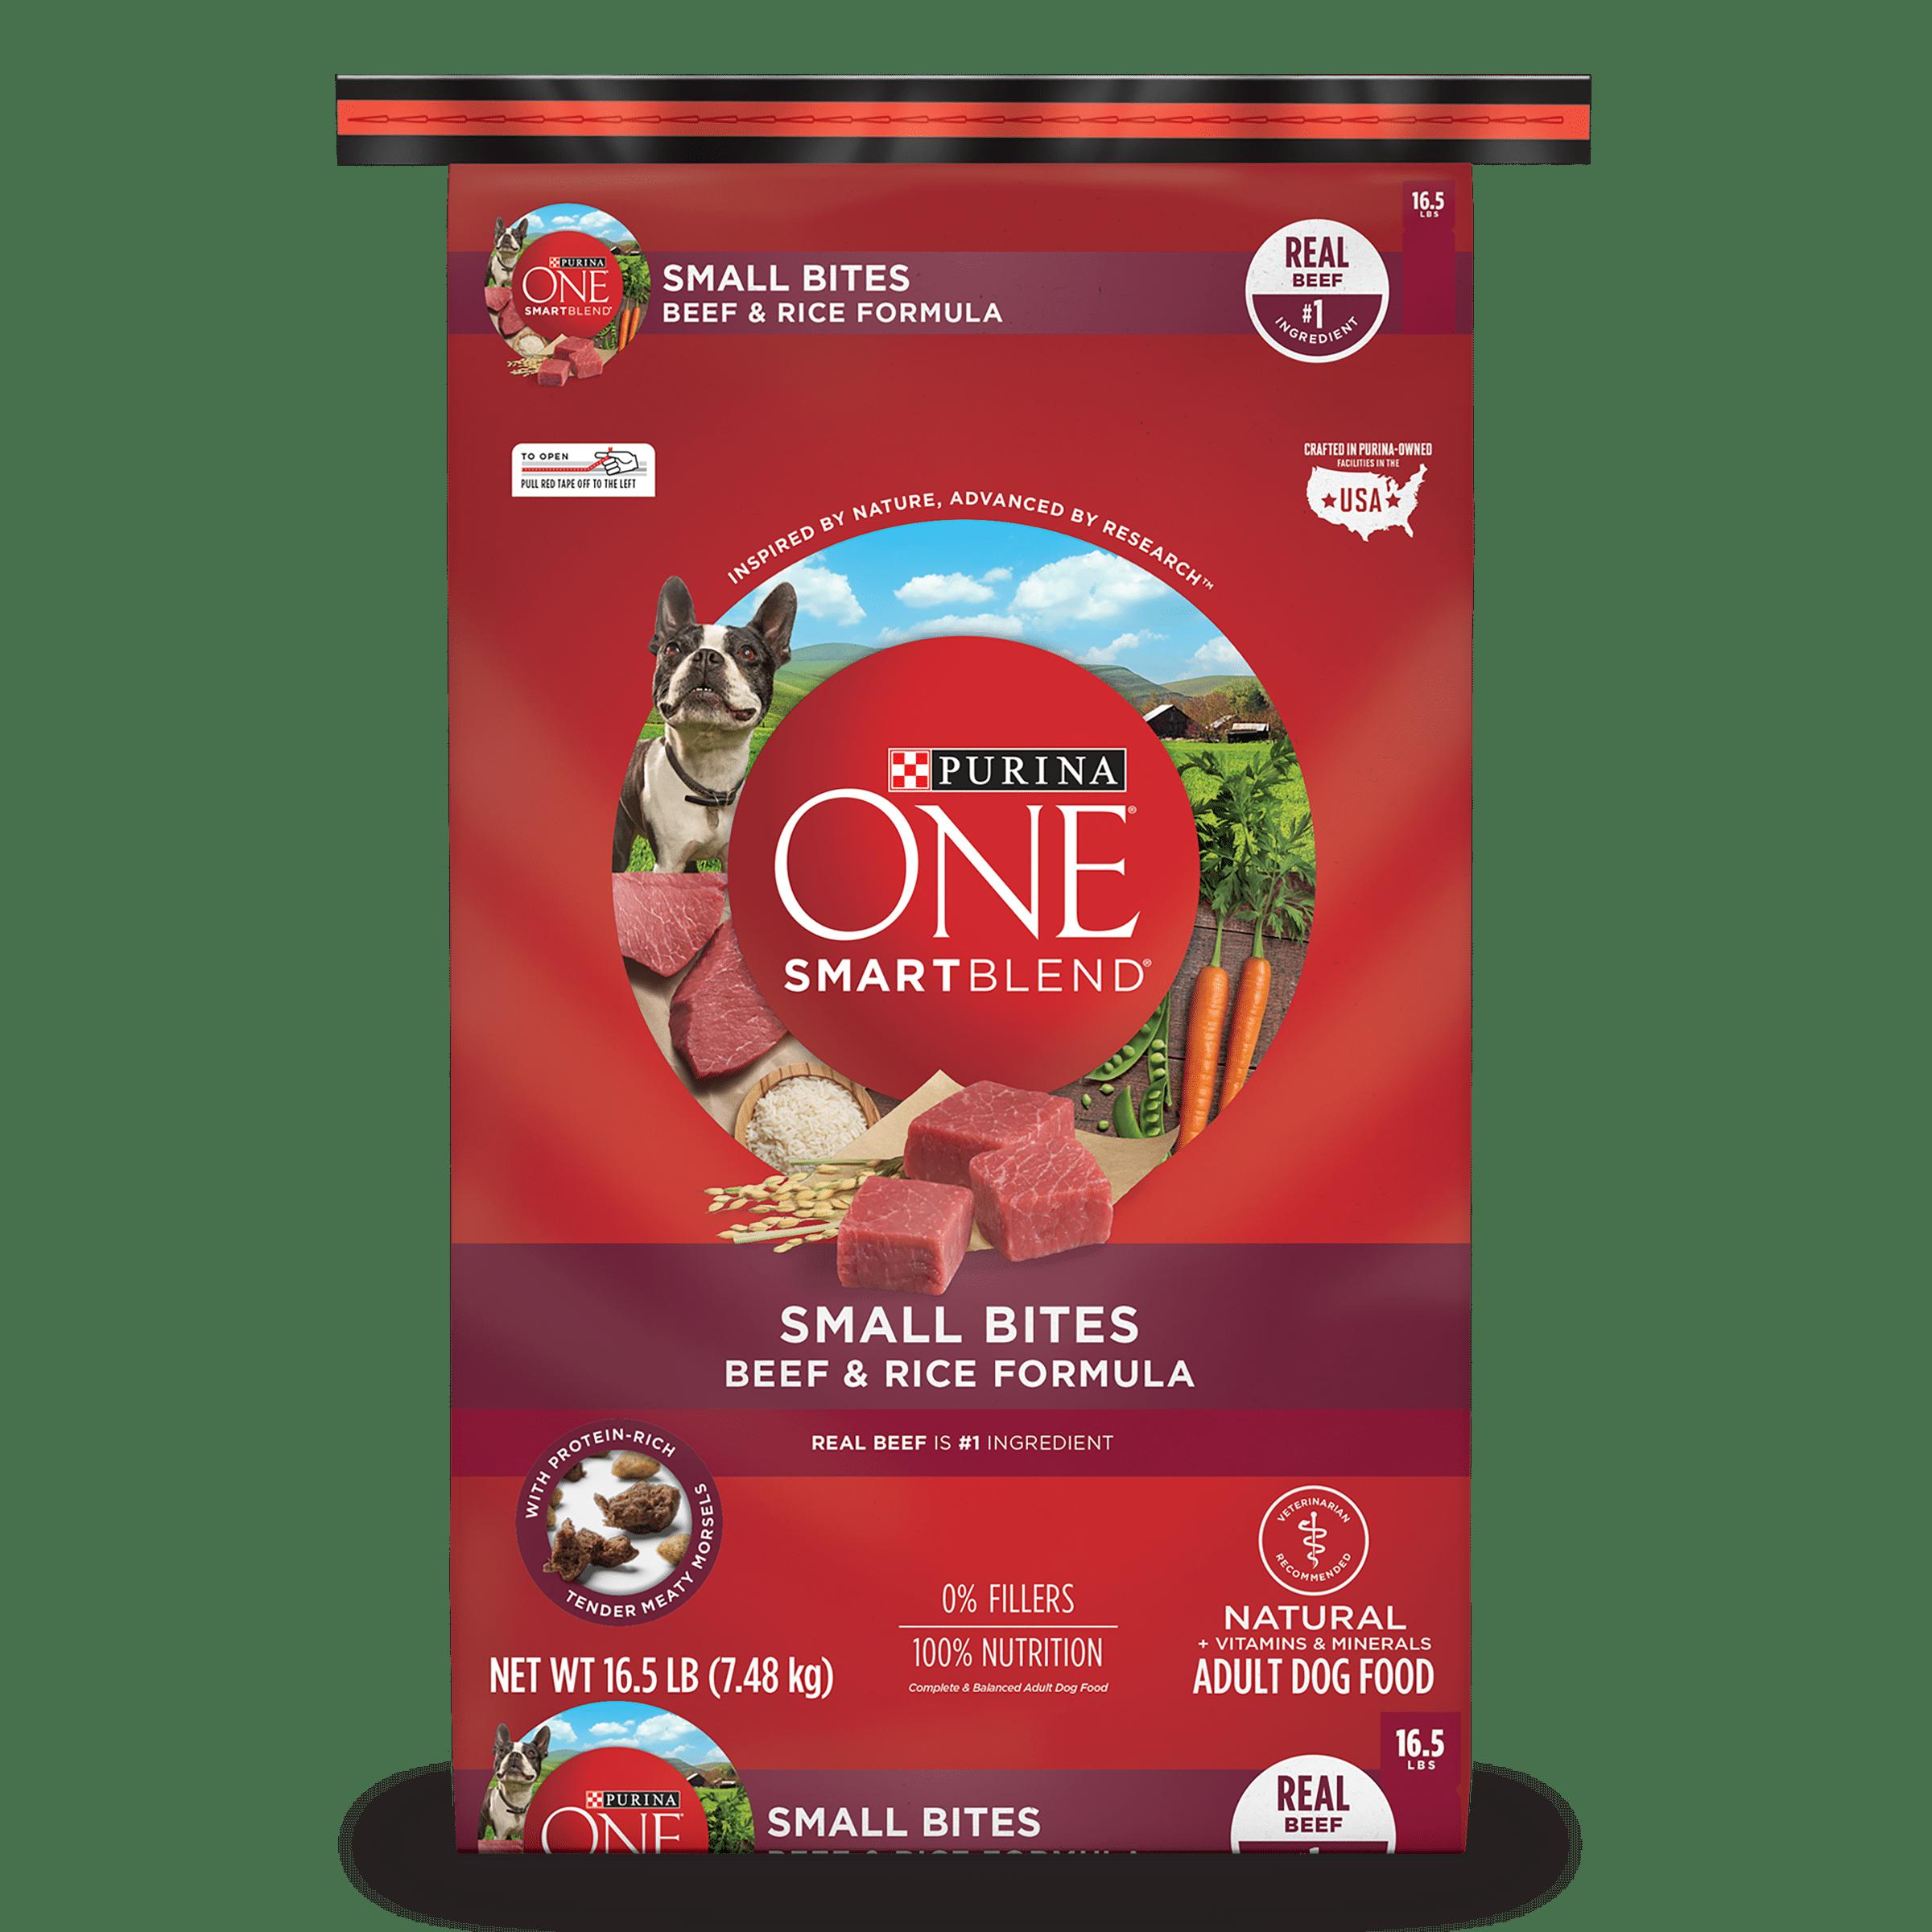 Purina ONE SmartBlend Natural Small Bites Beef & Rice Formula Adult Dry Dog Food - 16.5 lb. Bag